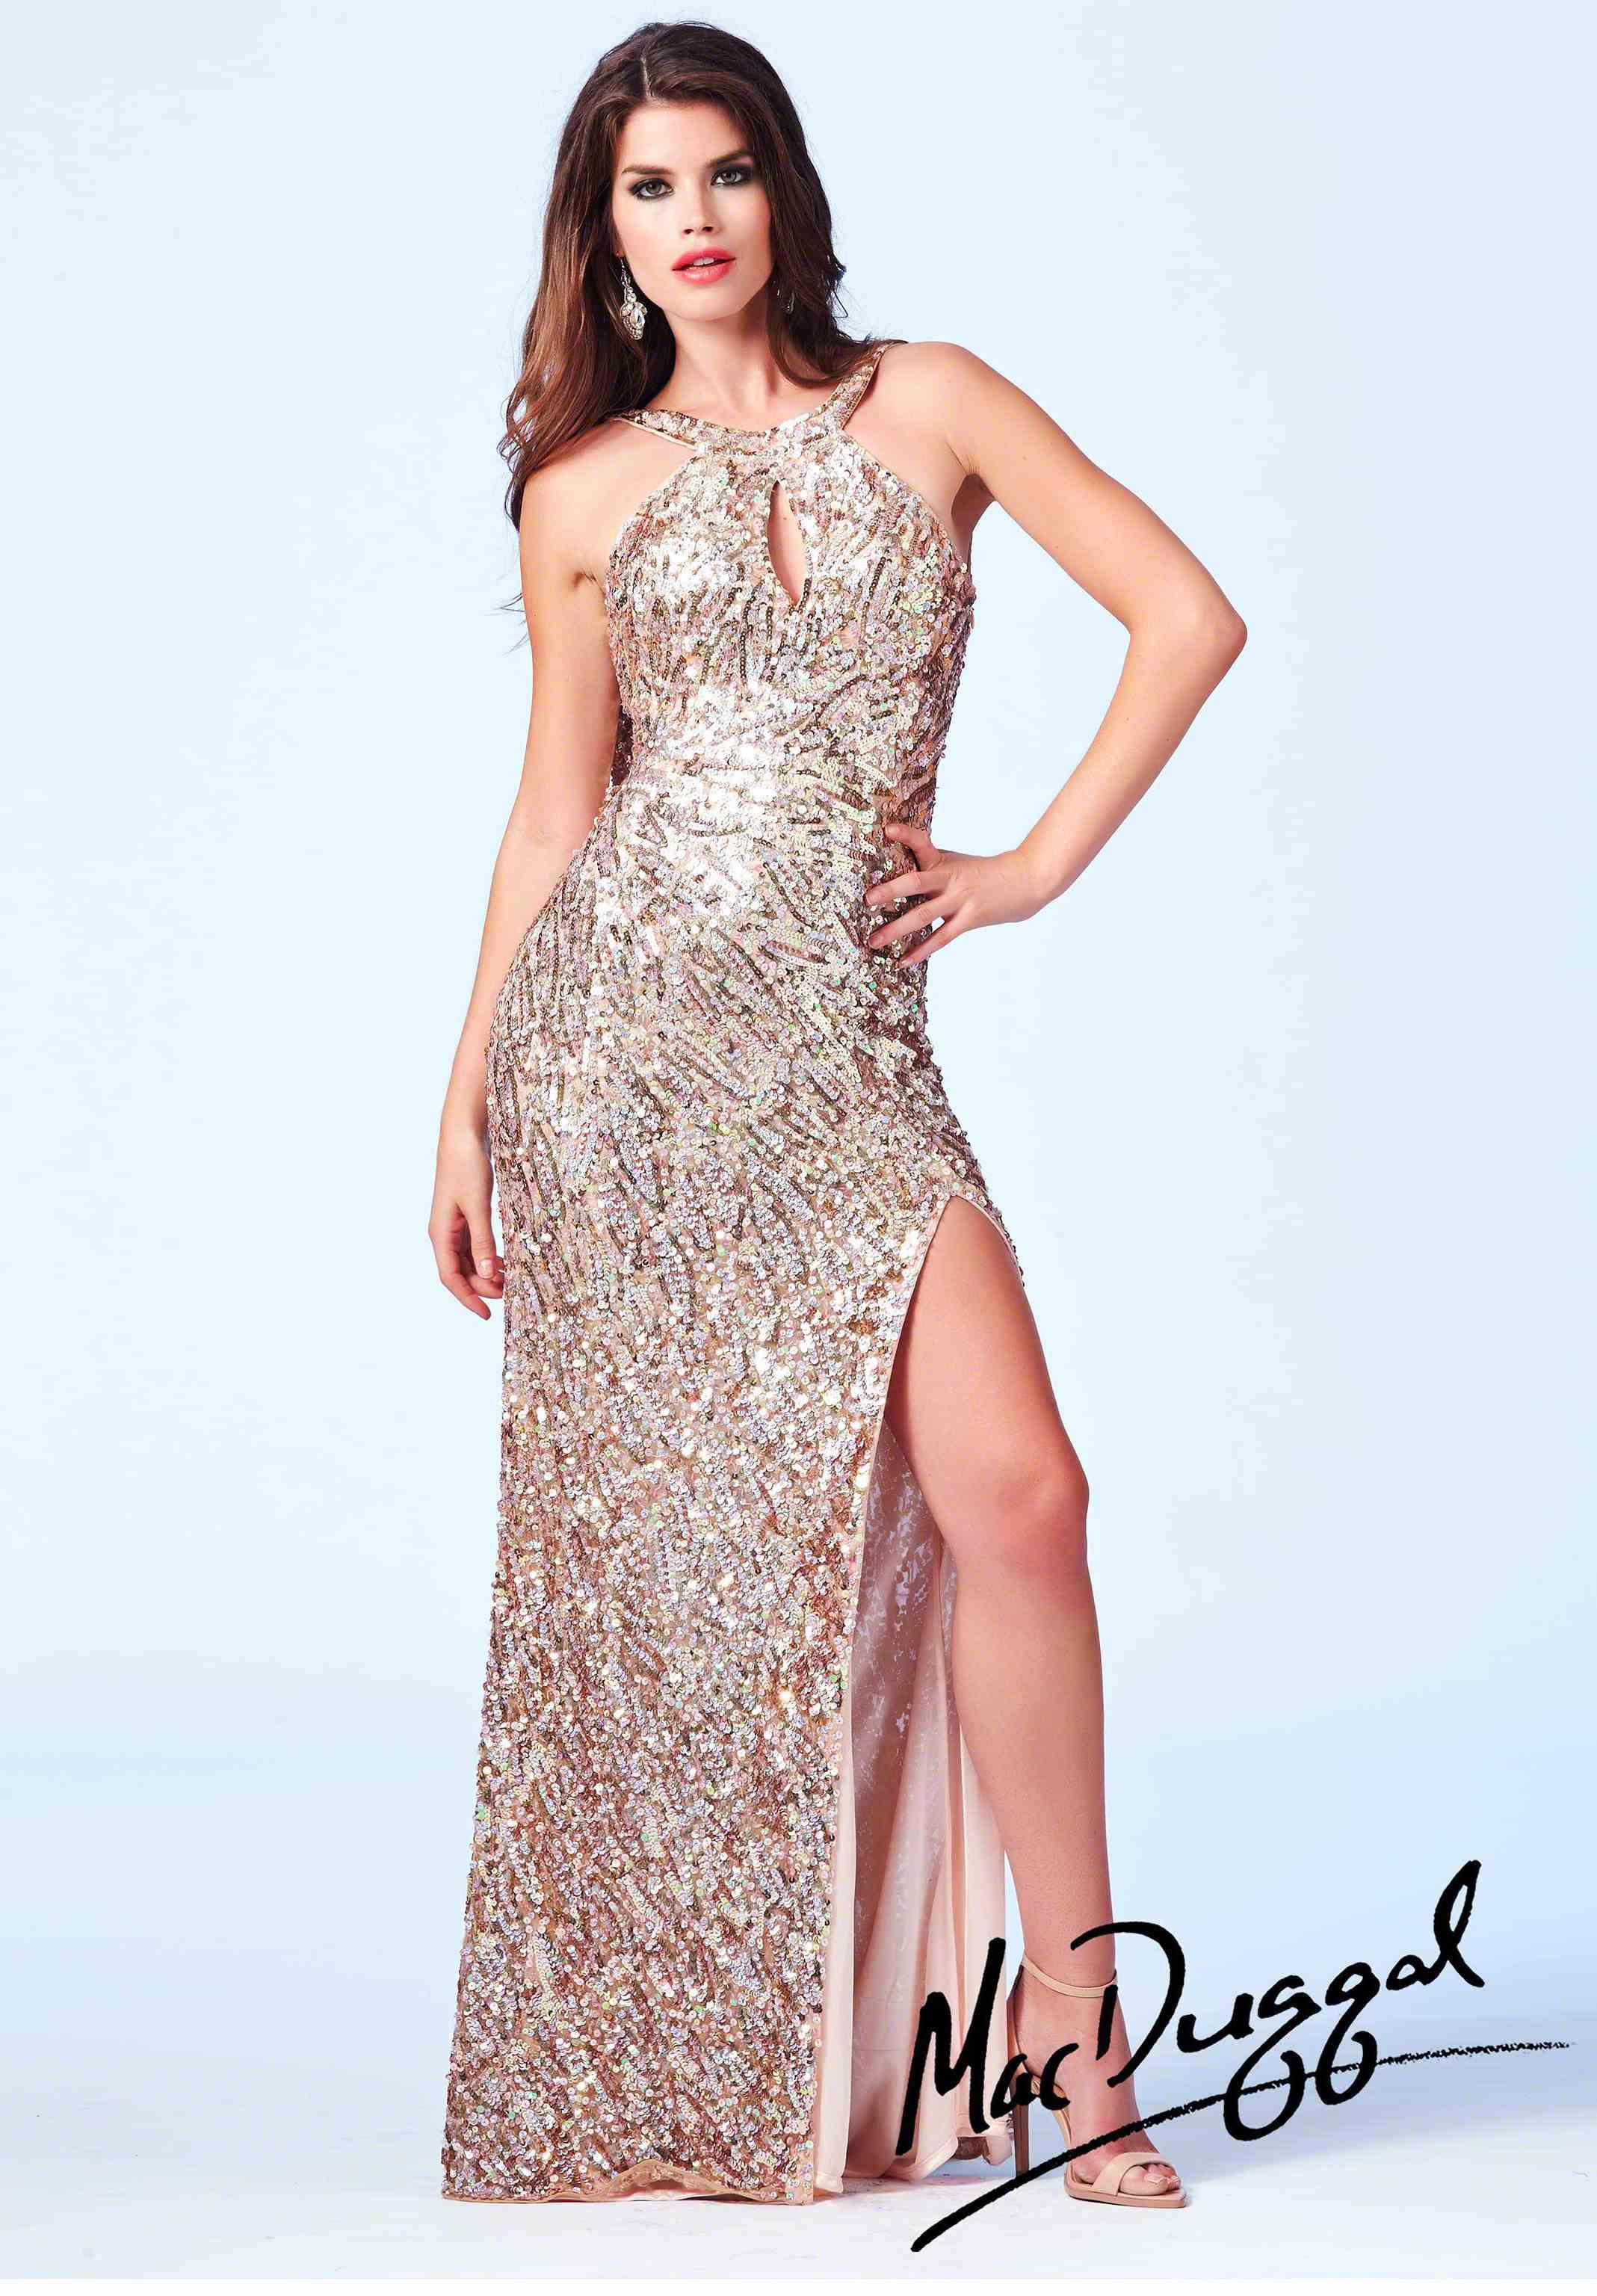 Enchanting Prom Dresses In Fargo Nd Ideas - Wedding Plan Ideas ...